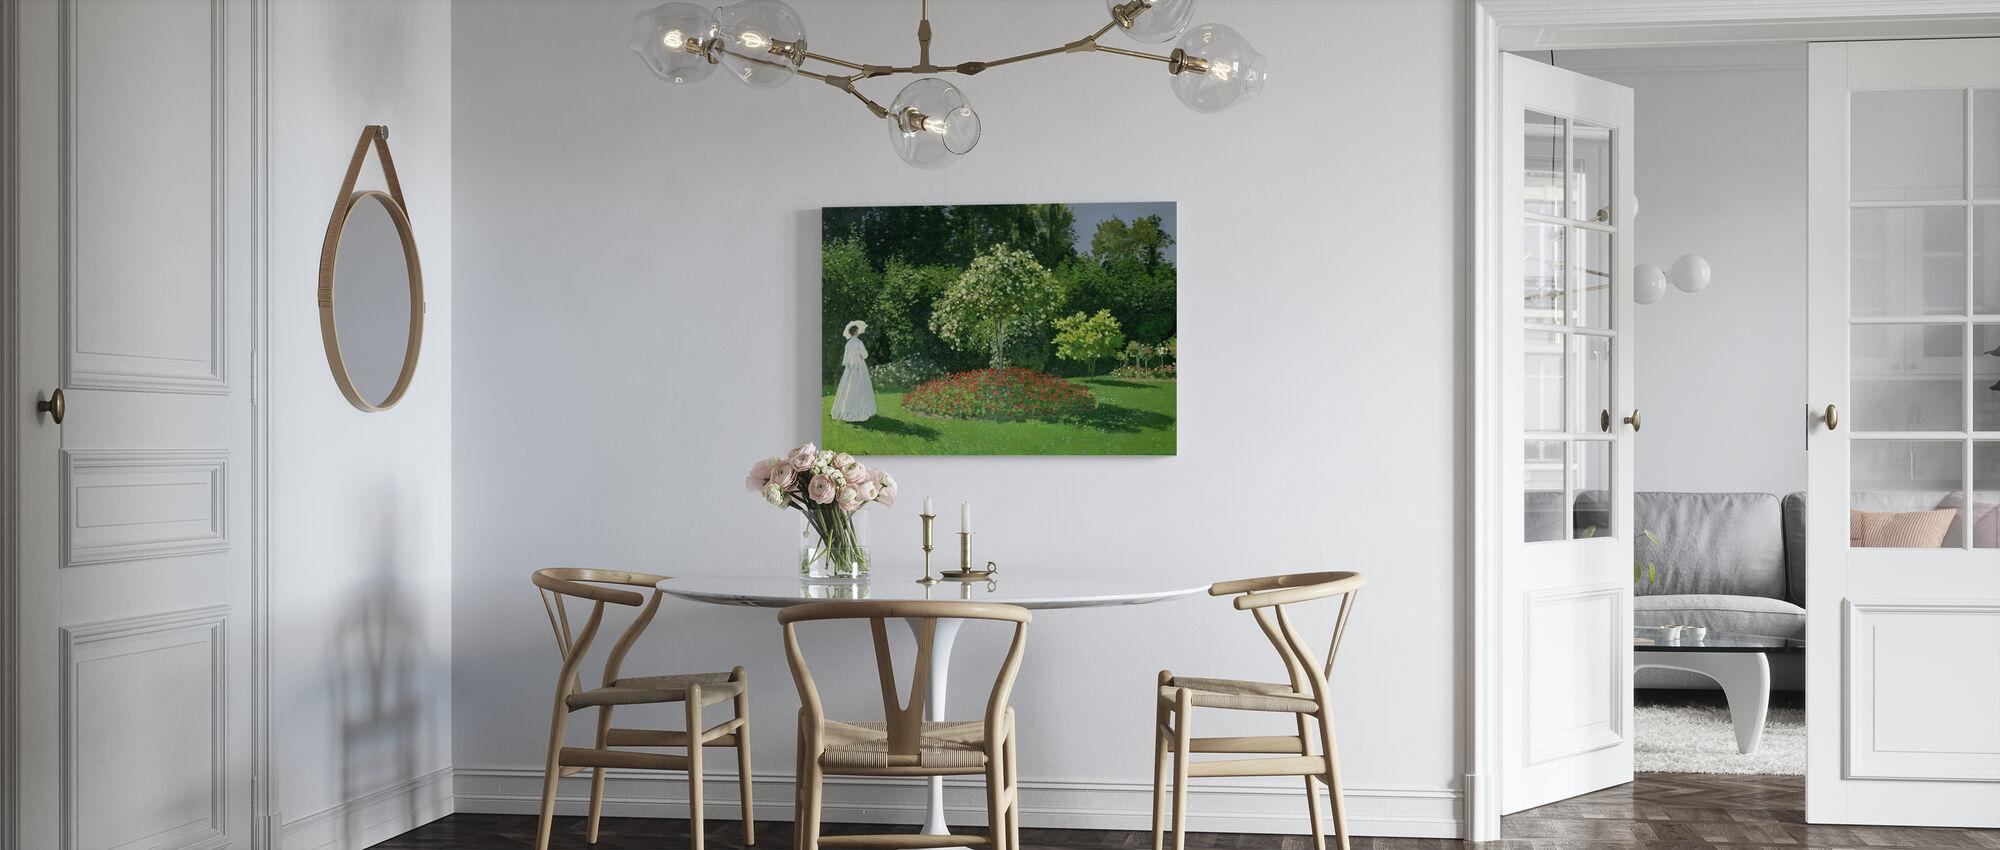 Woman in a Garden - Claude Monet - Canvas print - Kitchen